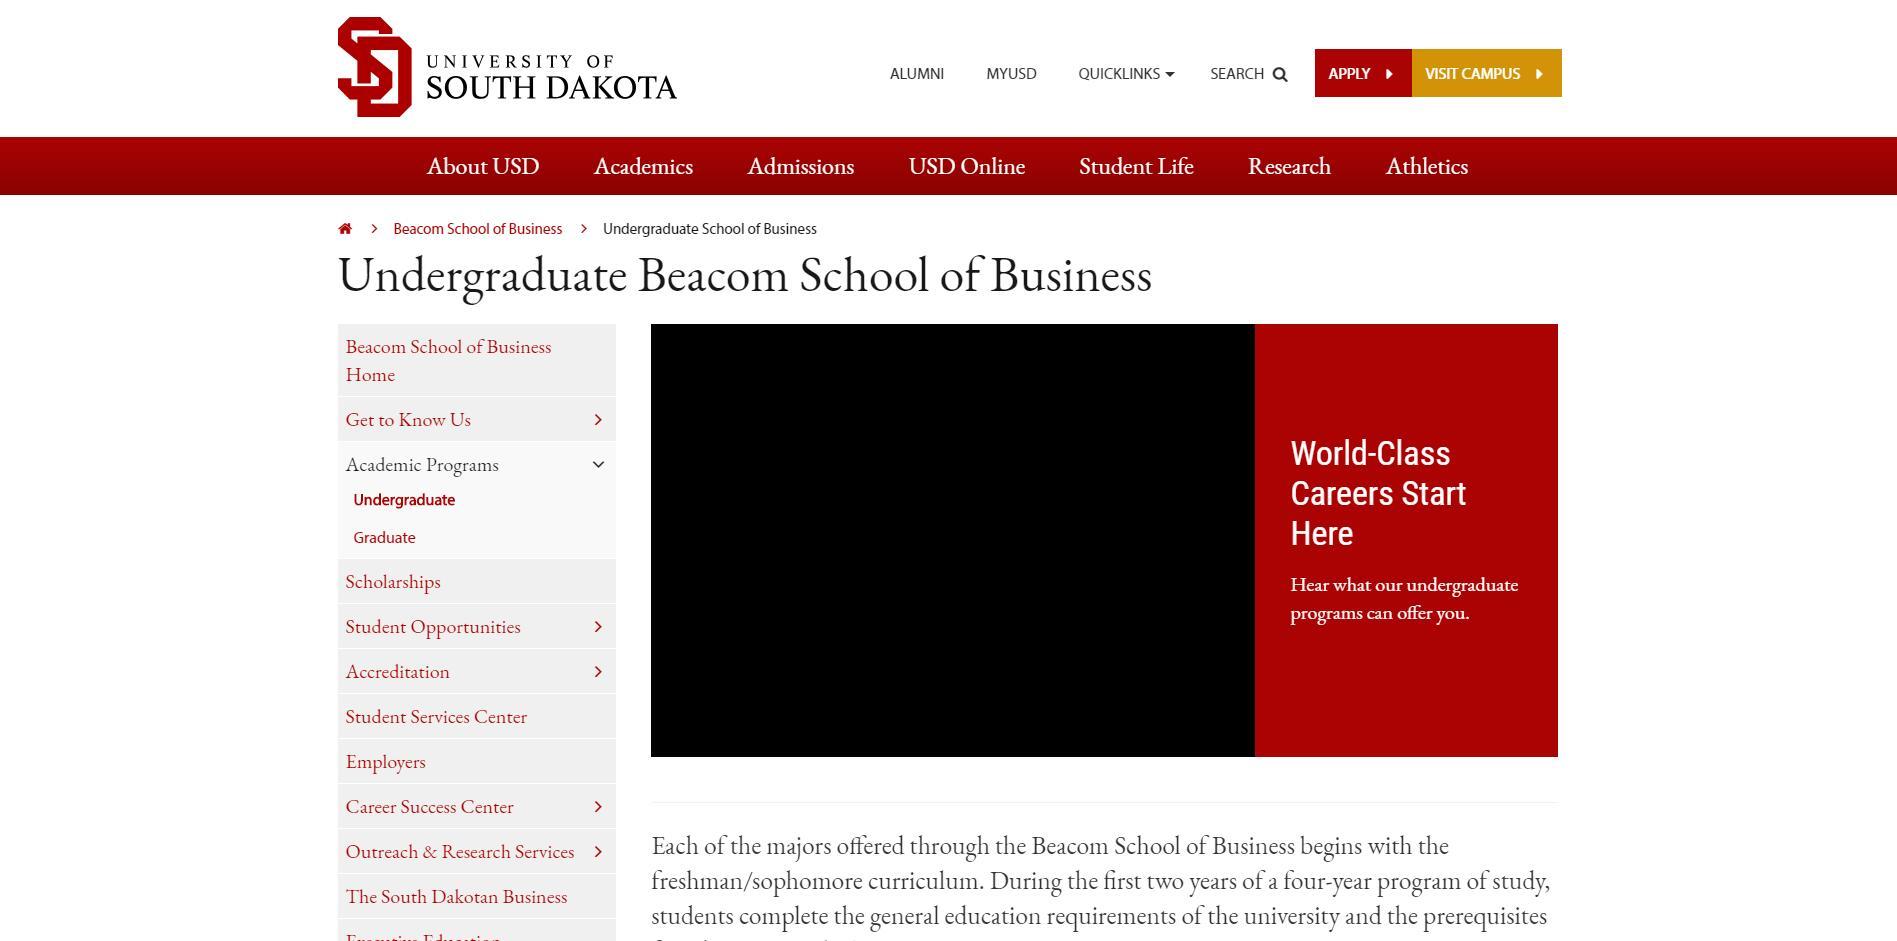 University of South Dakota Undergraduate Business